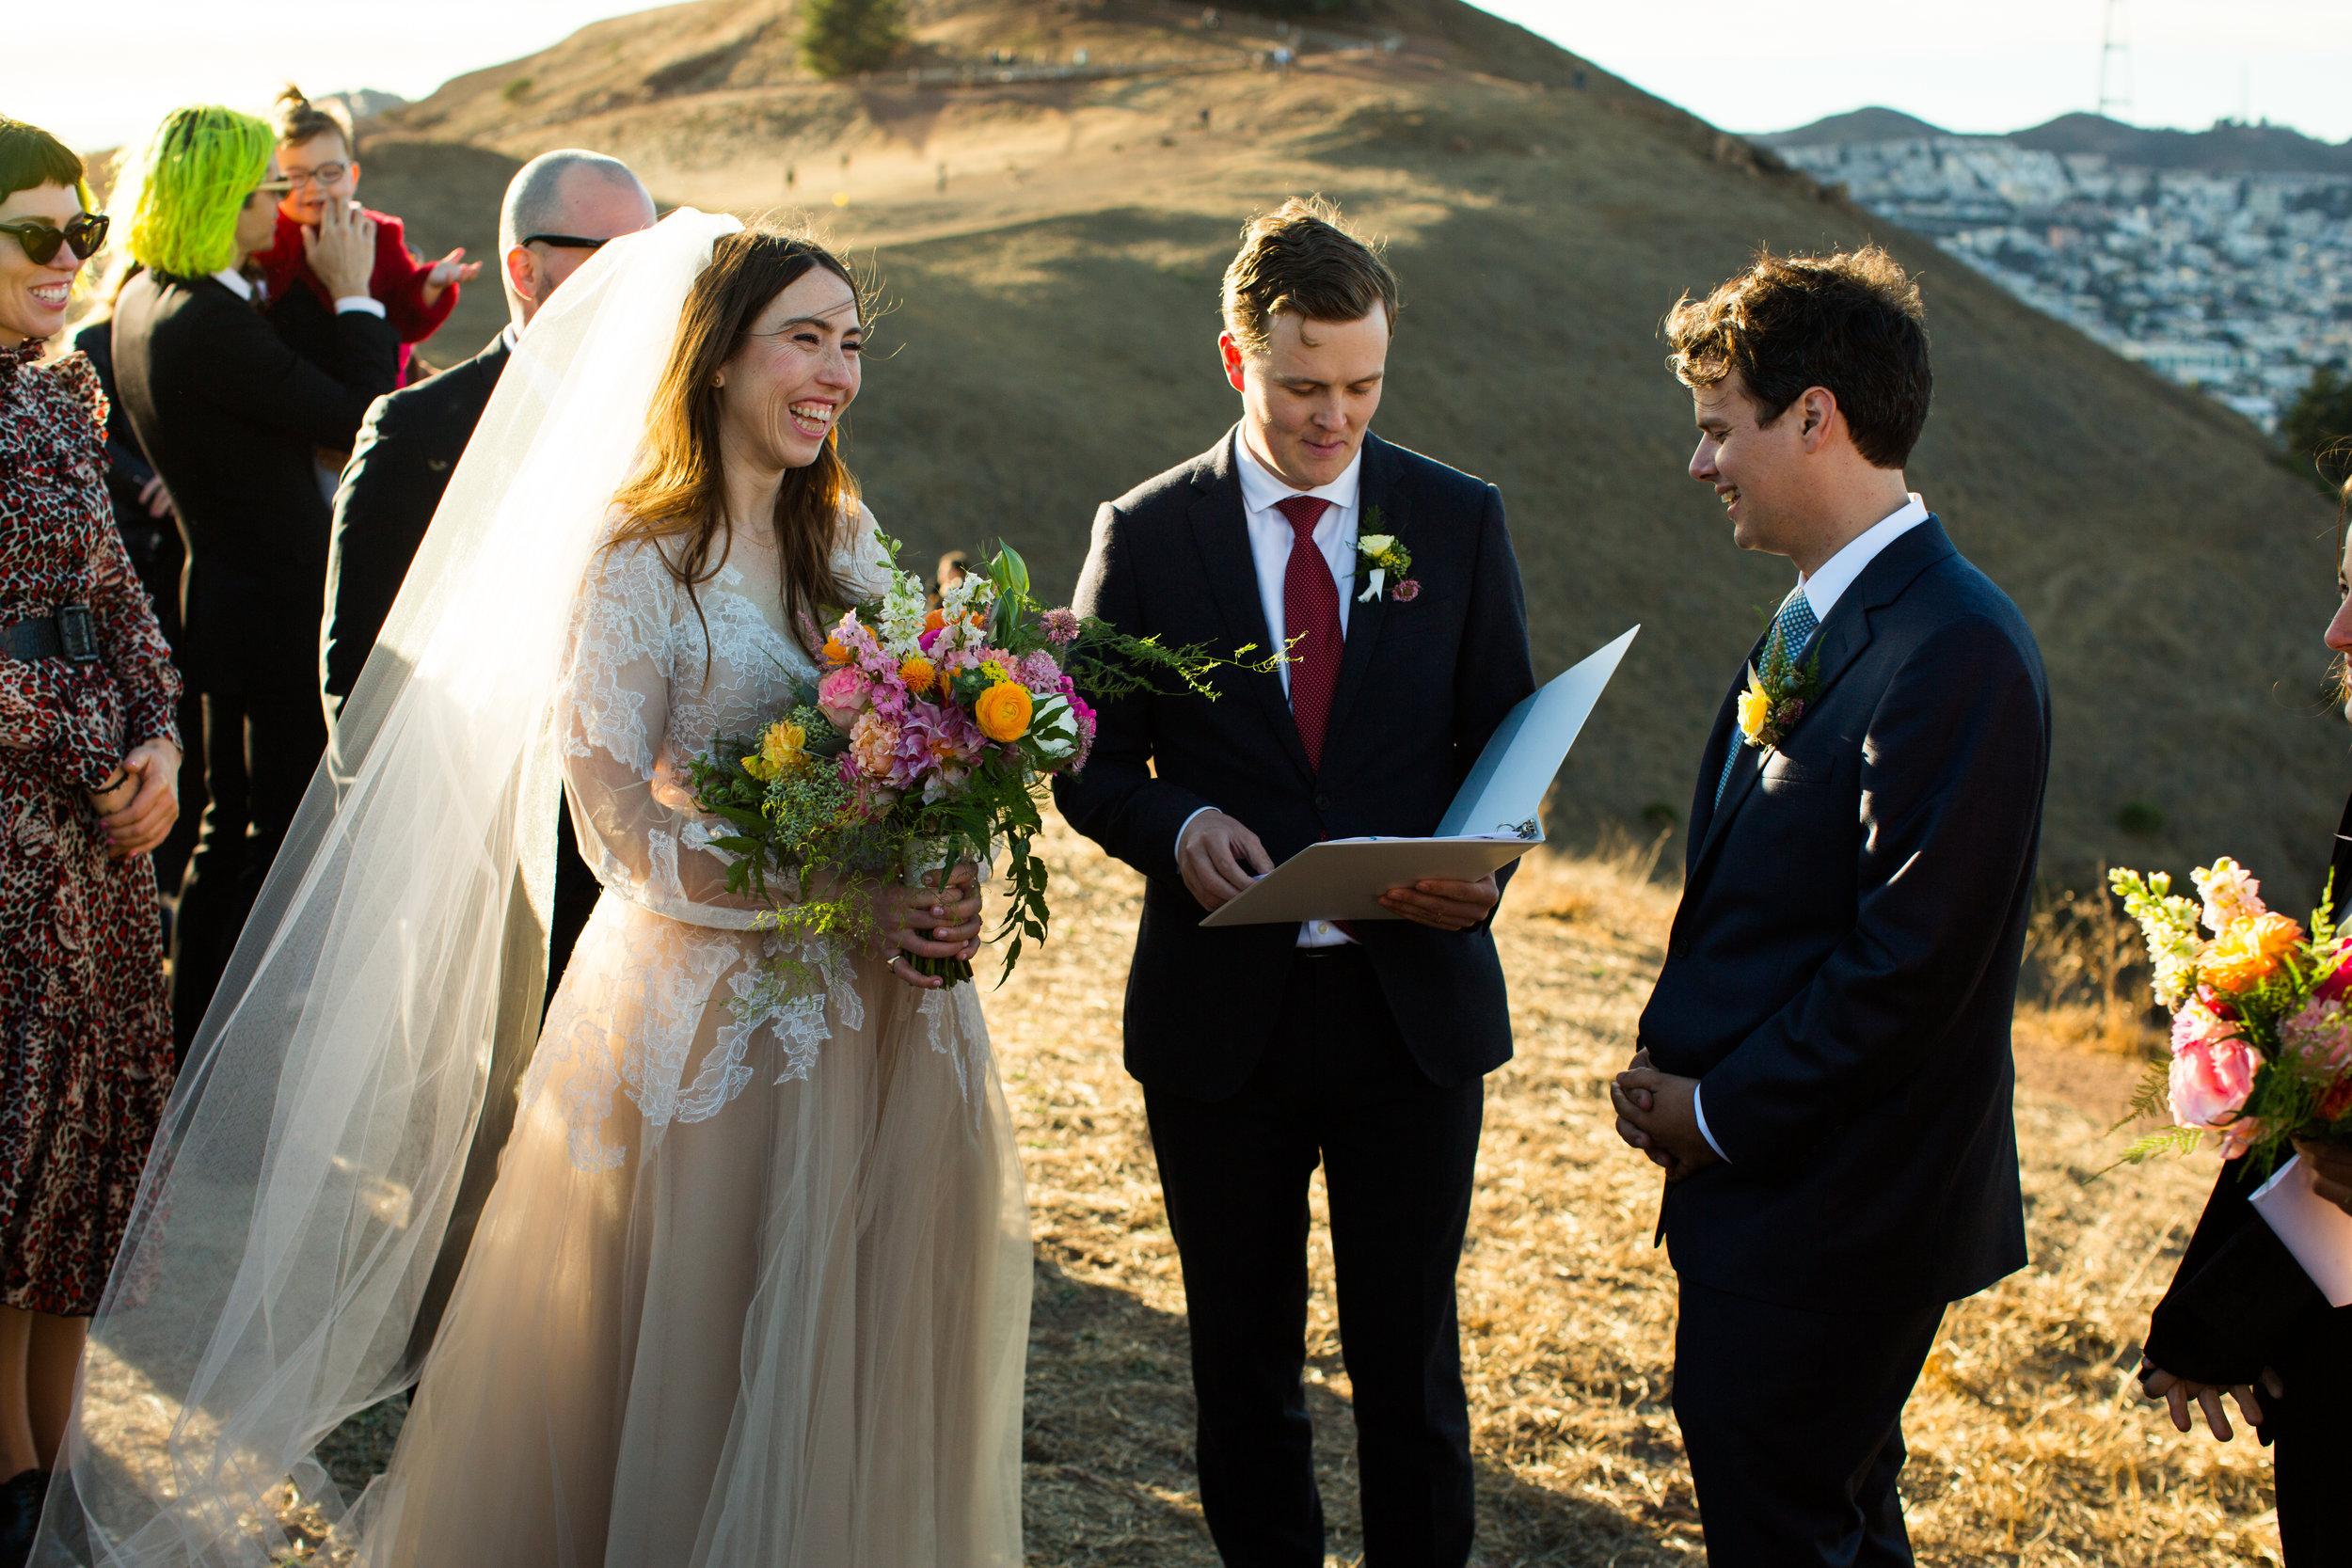 Bernal Heights Park Wedding Ceremony-99.jpg